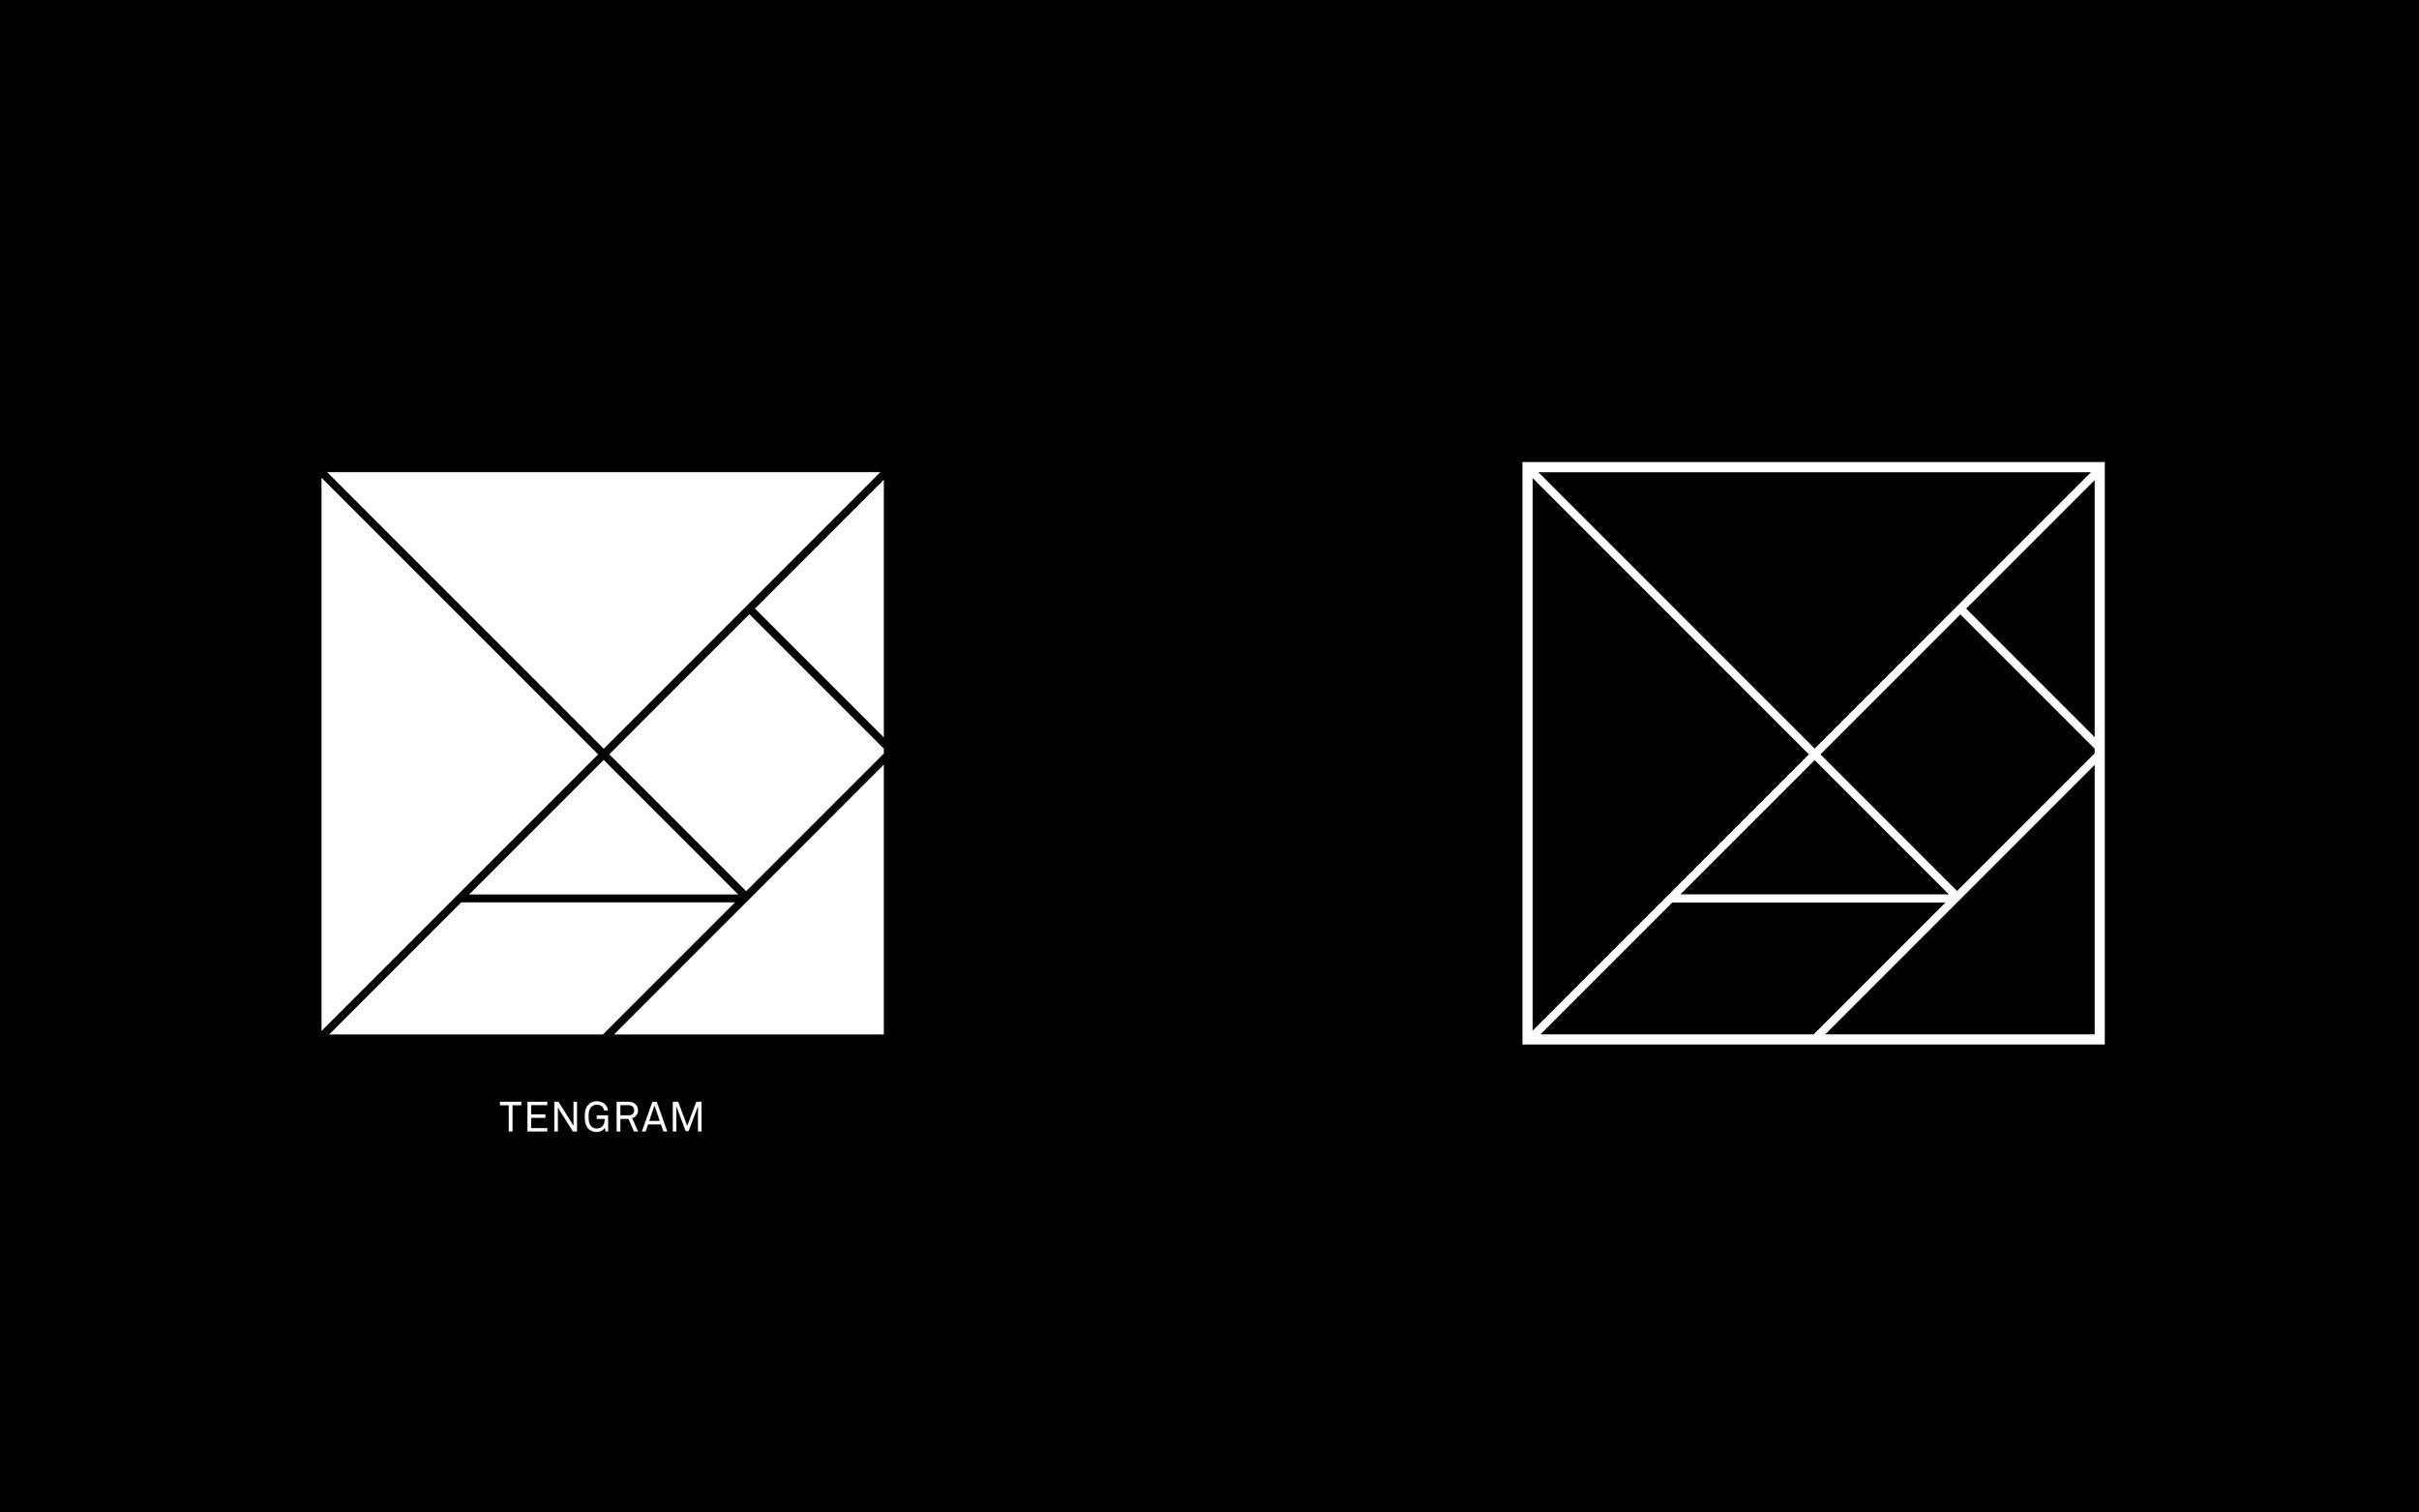 logo-integrity-01.png